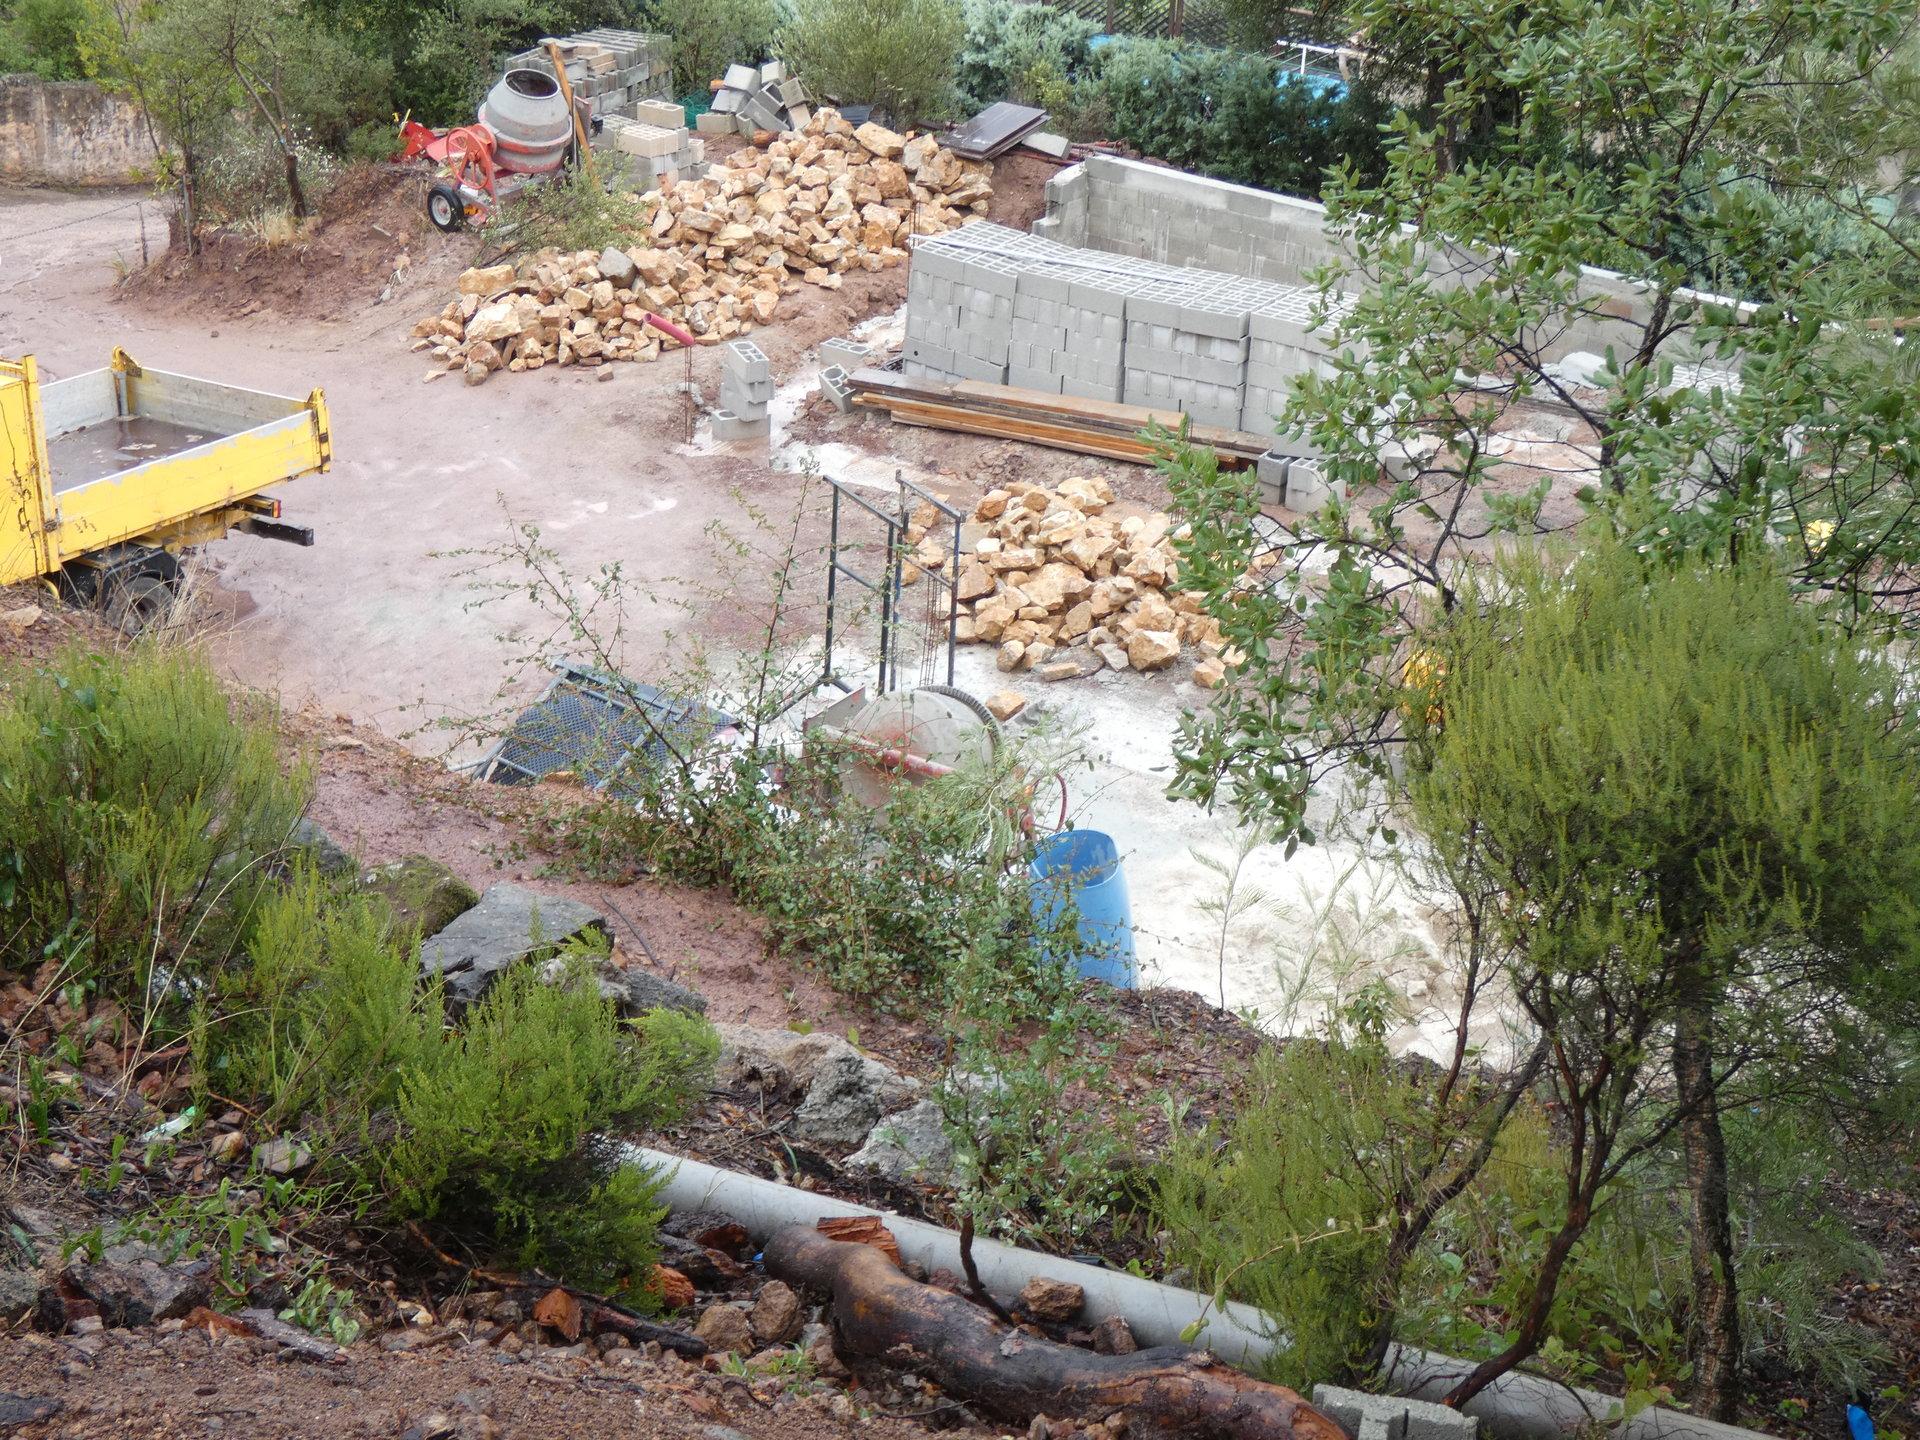 TARADEAU VILLA EN CONSTRUCTION